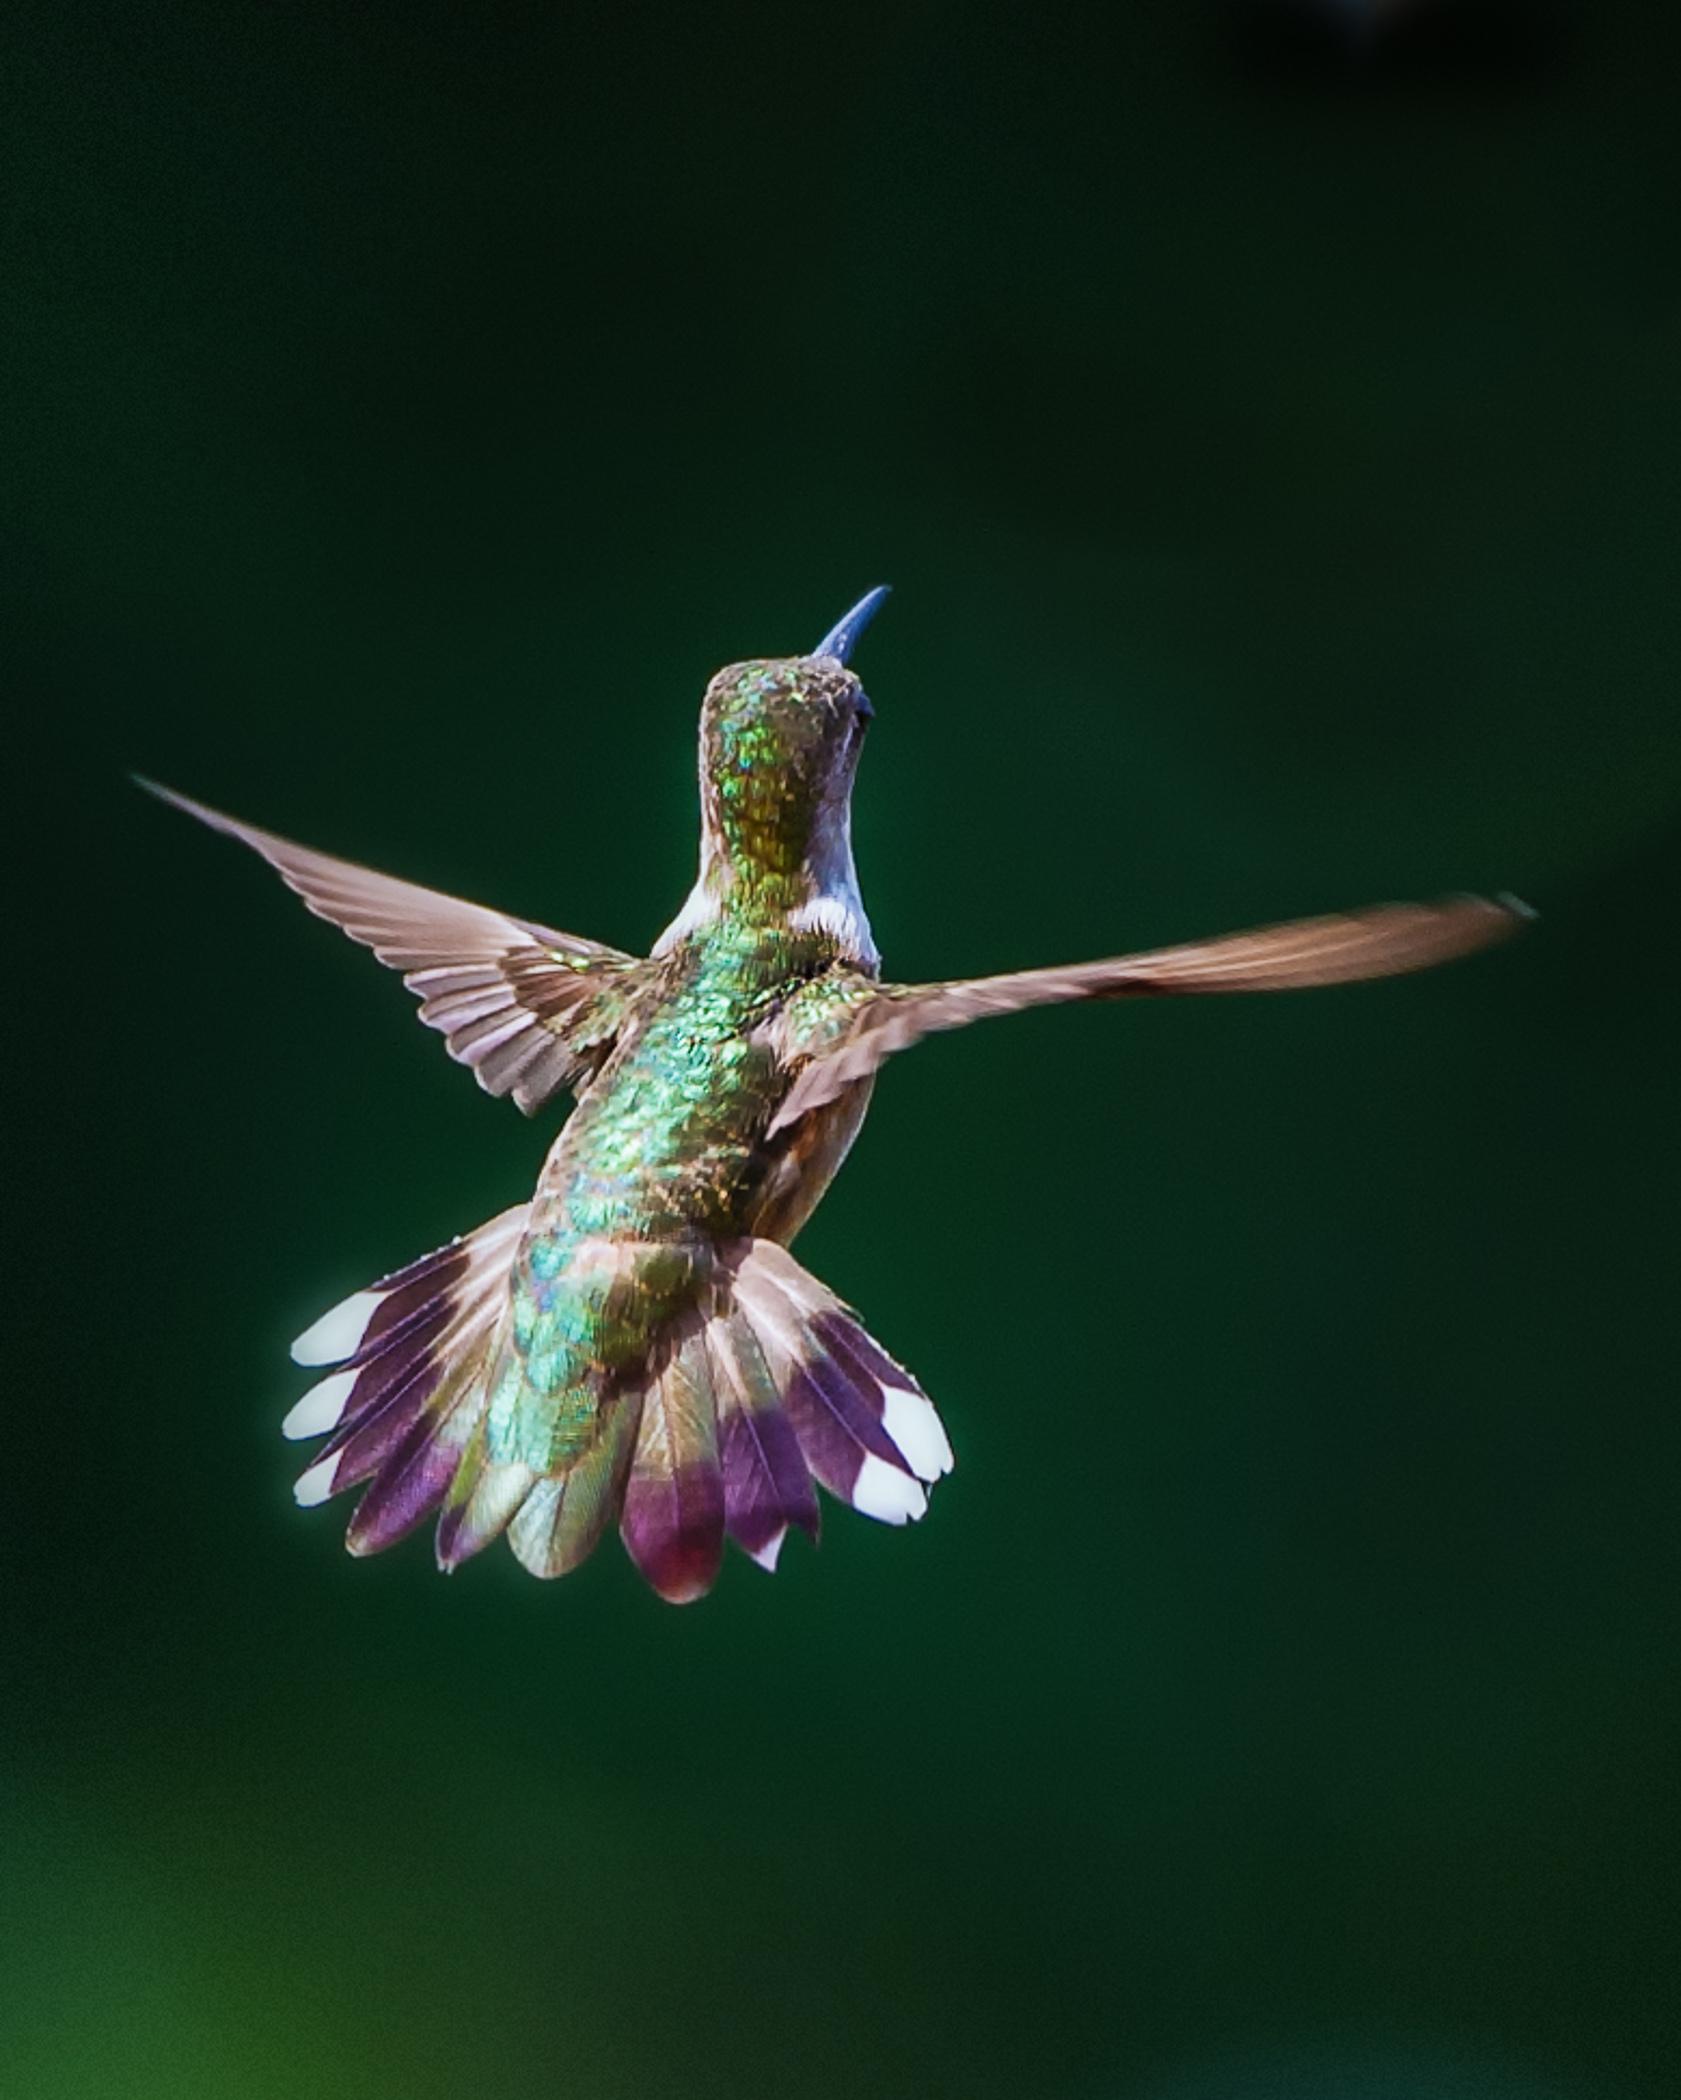 2014-08-05_Hummingbirds_Booker_0043-Edit-Edit-Edit.jpg